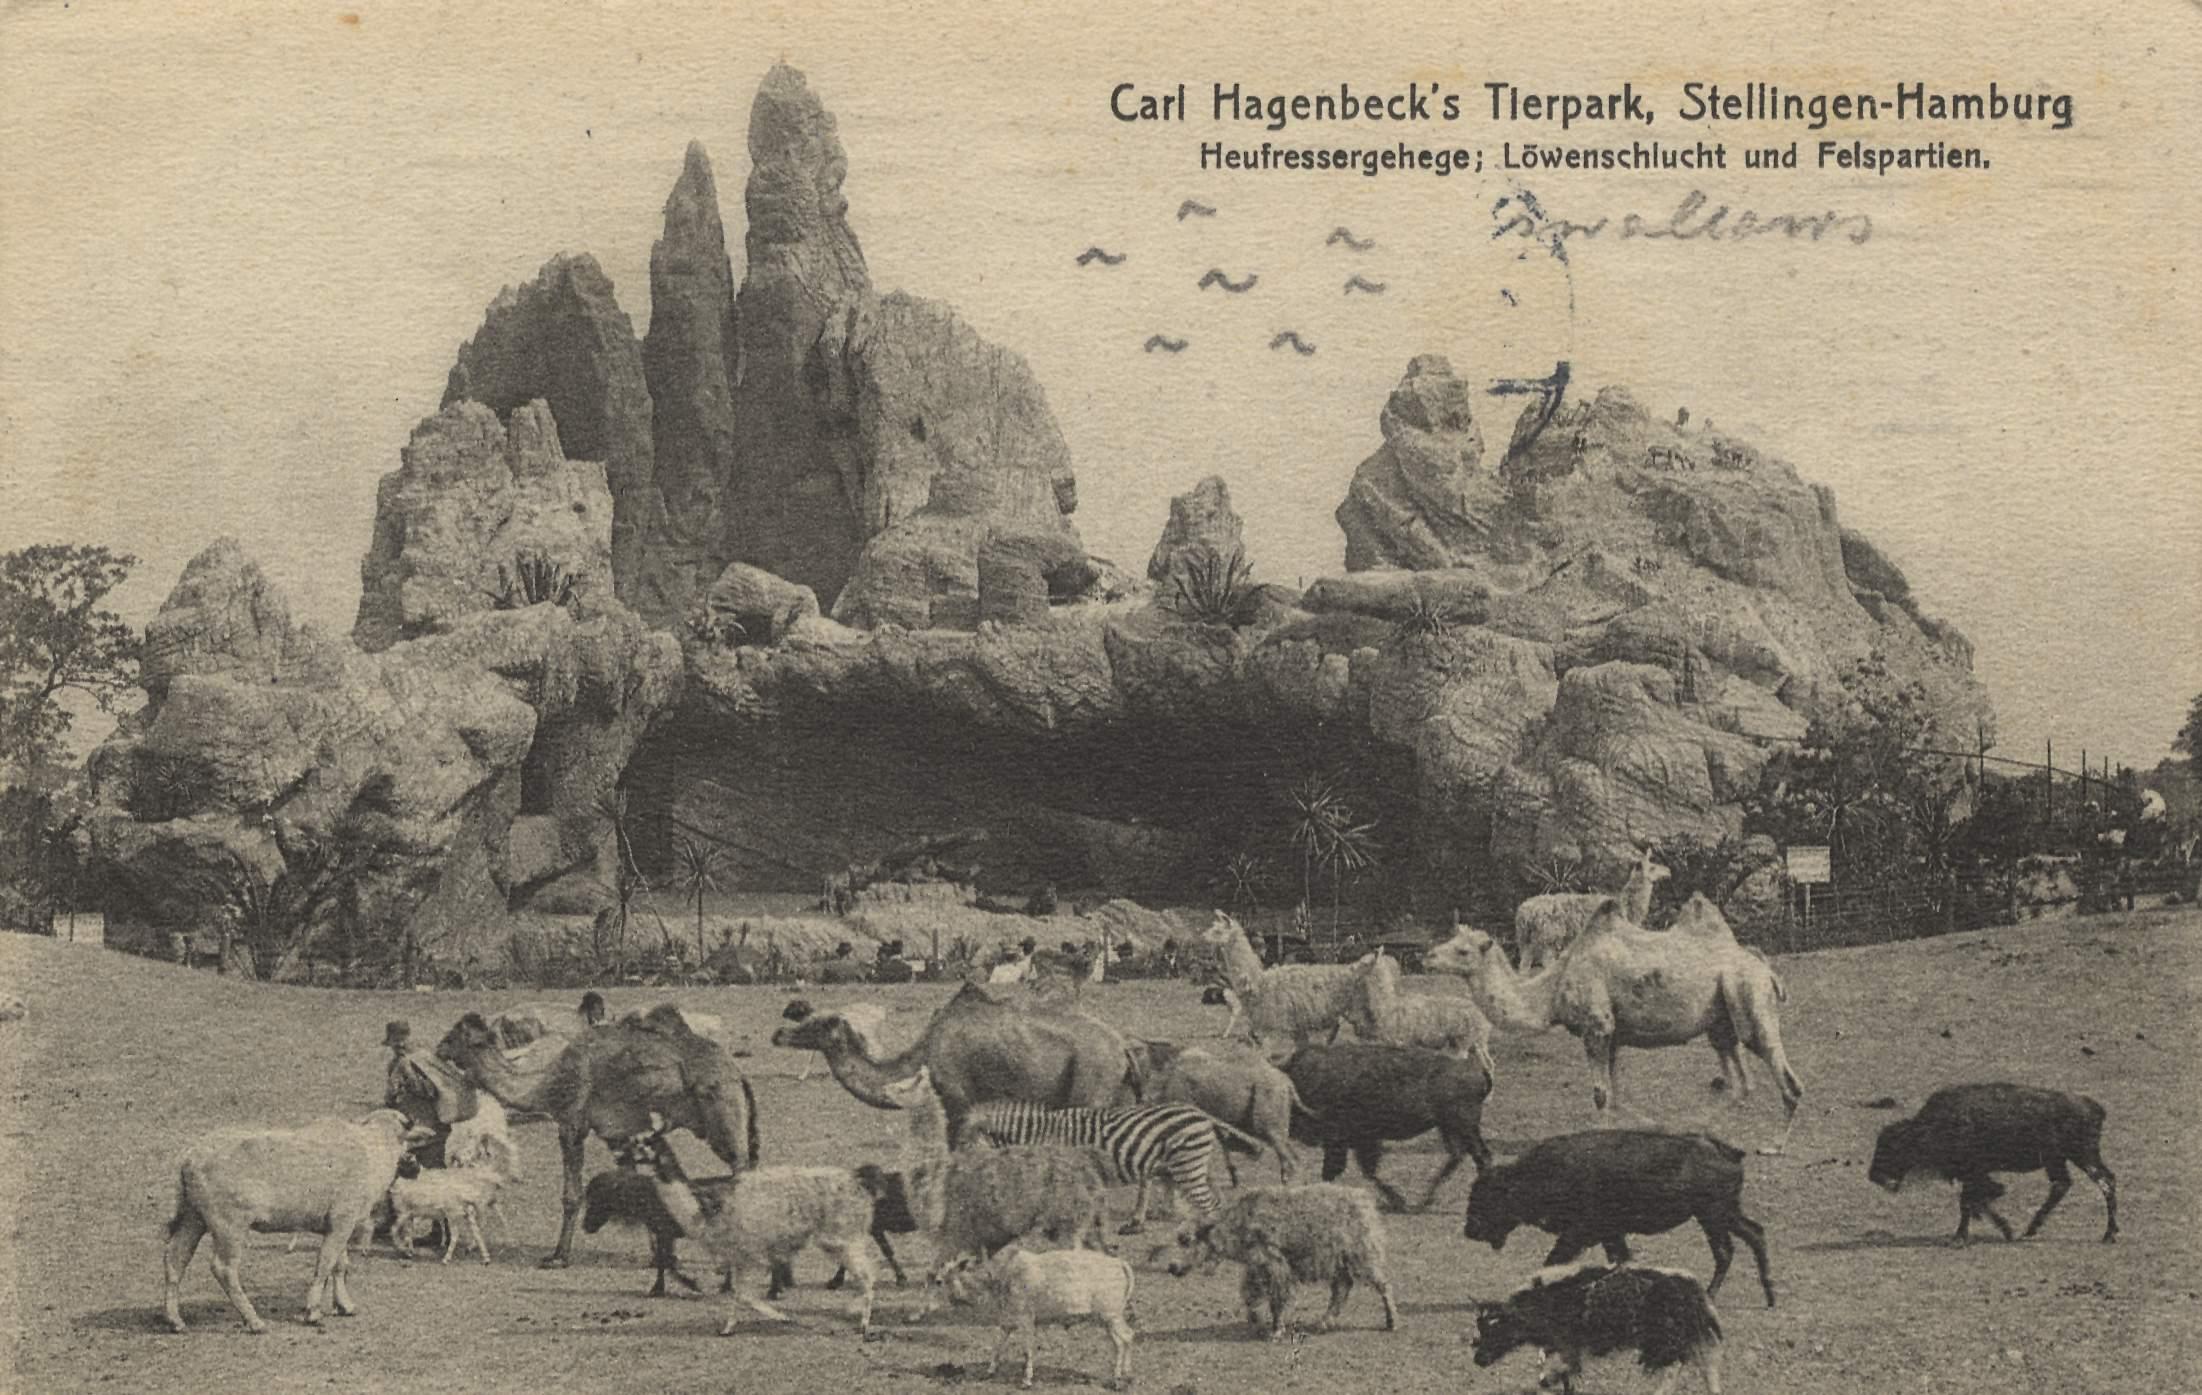 Delicieux Hamburg, Hamburg: Zoologischer Garten; Carl Hagenbecks Tierpark;  Heufressergehege